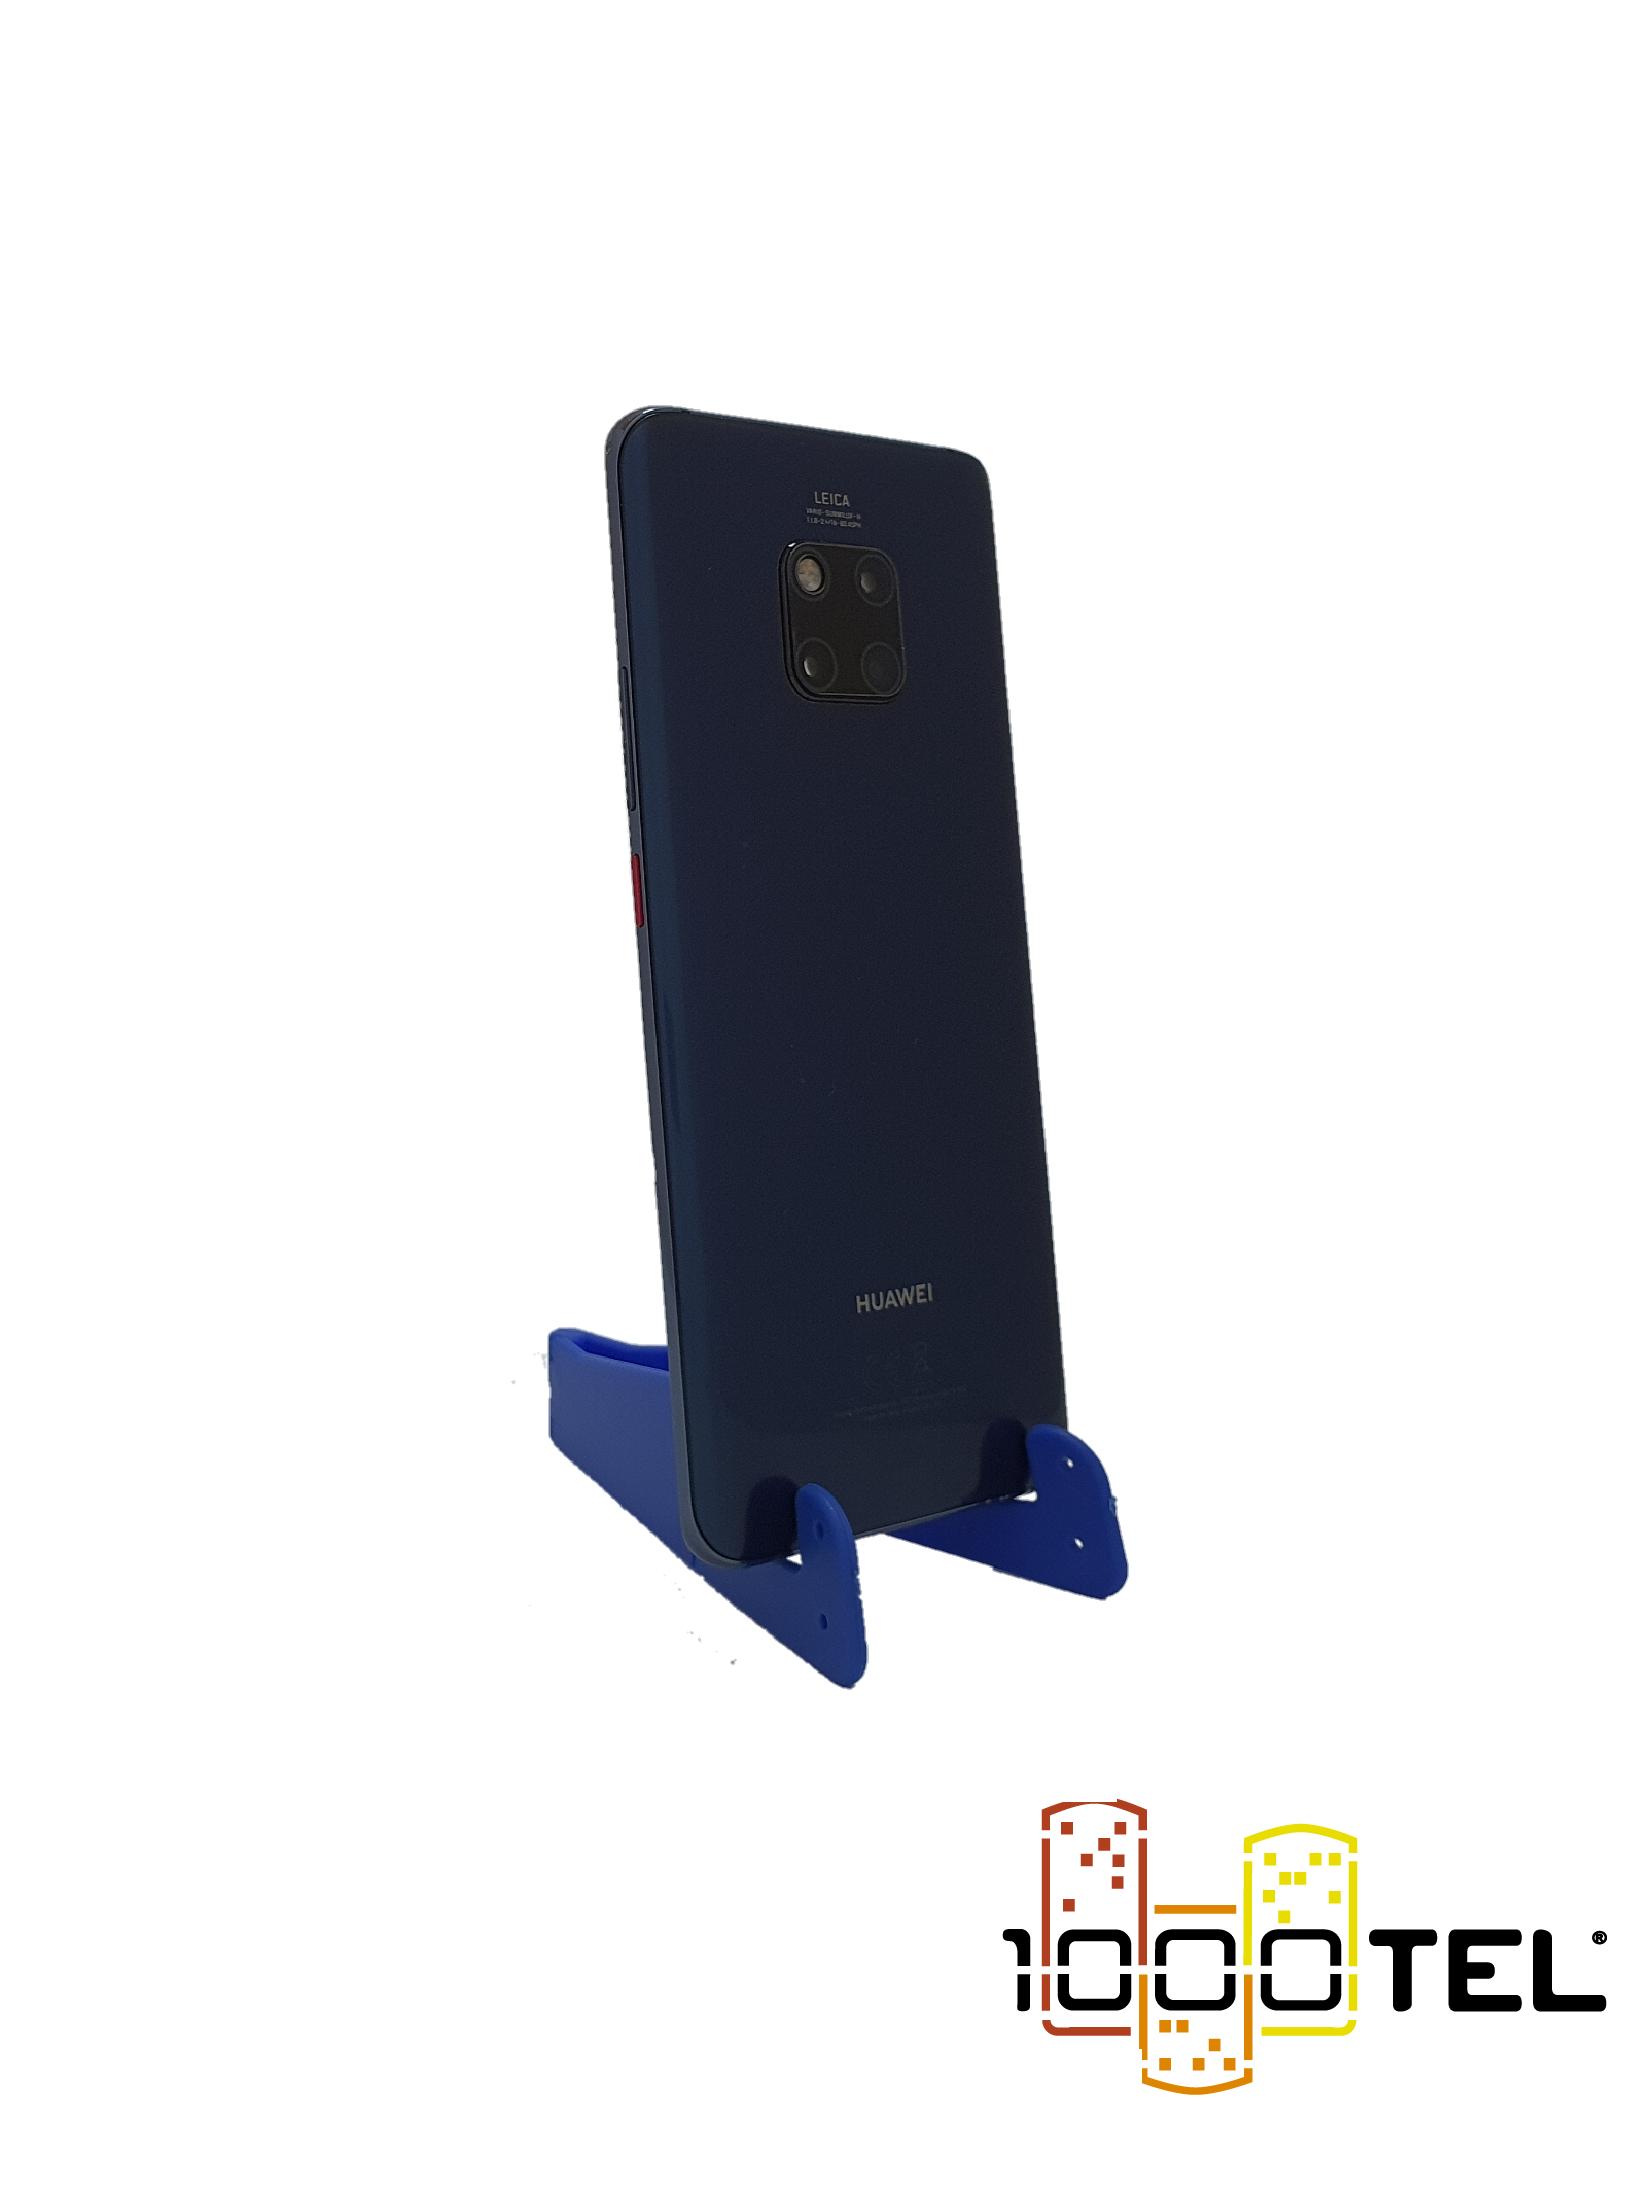 Huawei Mate 20 Pro #3